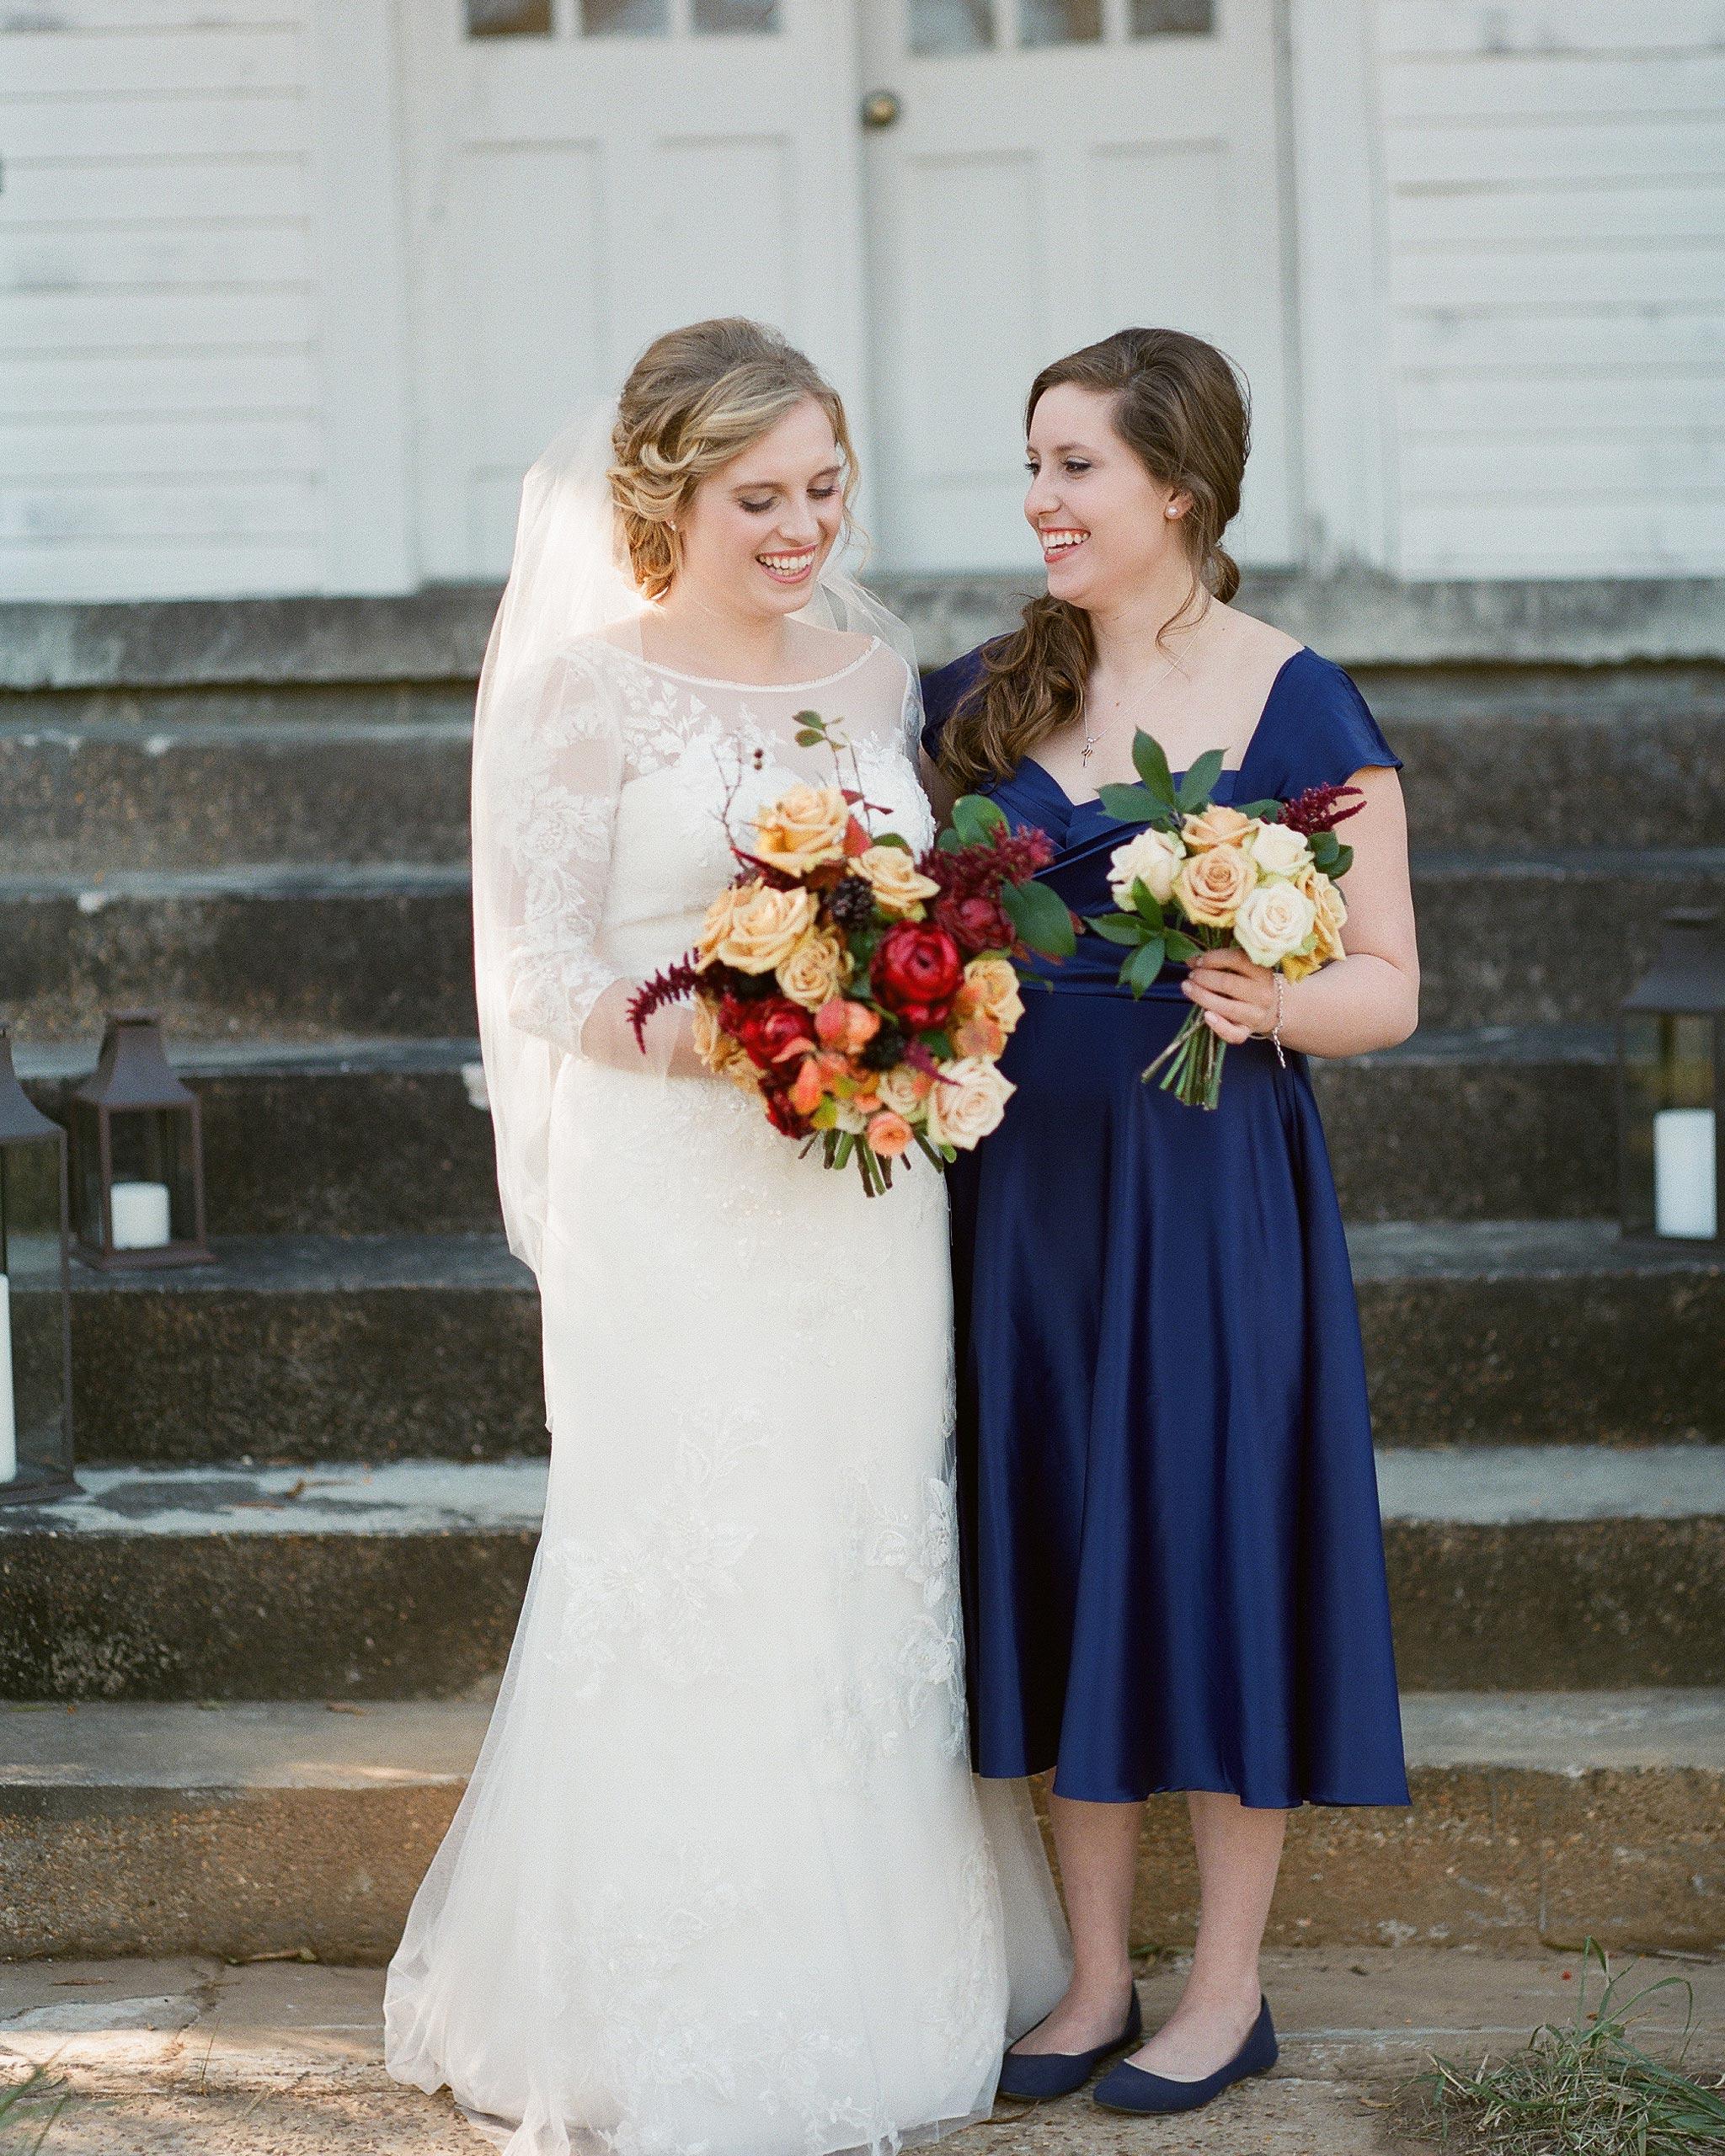 katie-nathan-wedding-thanksgiving-maidofhonor-166-s113017.jpg